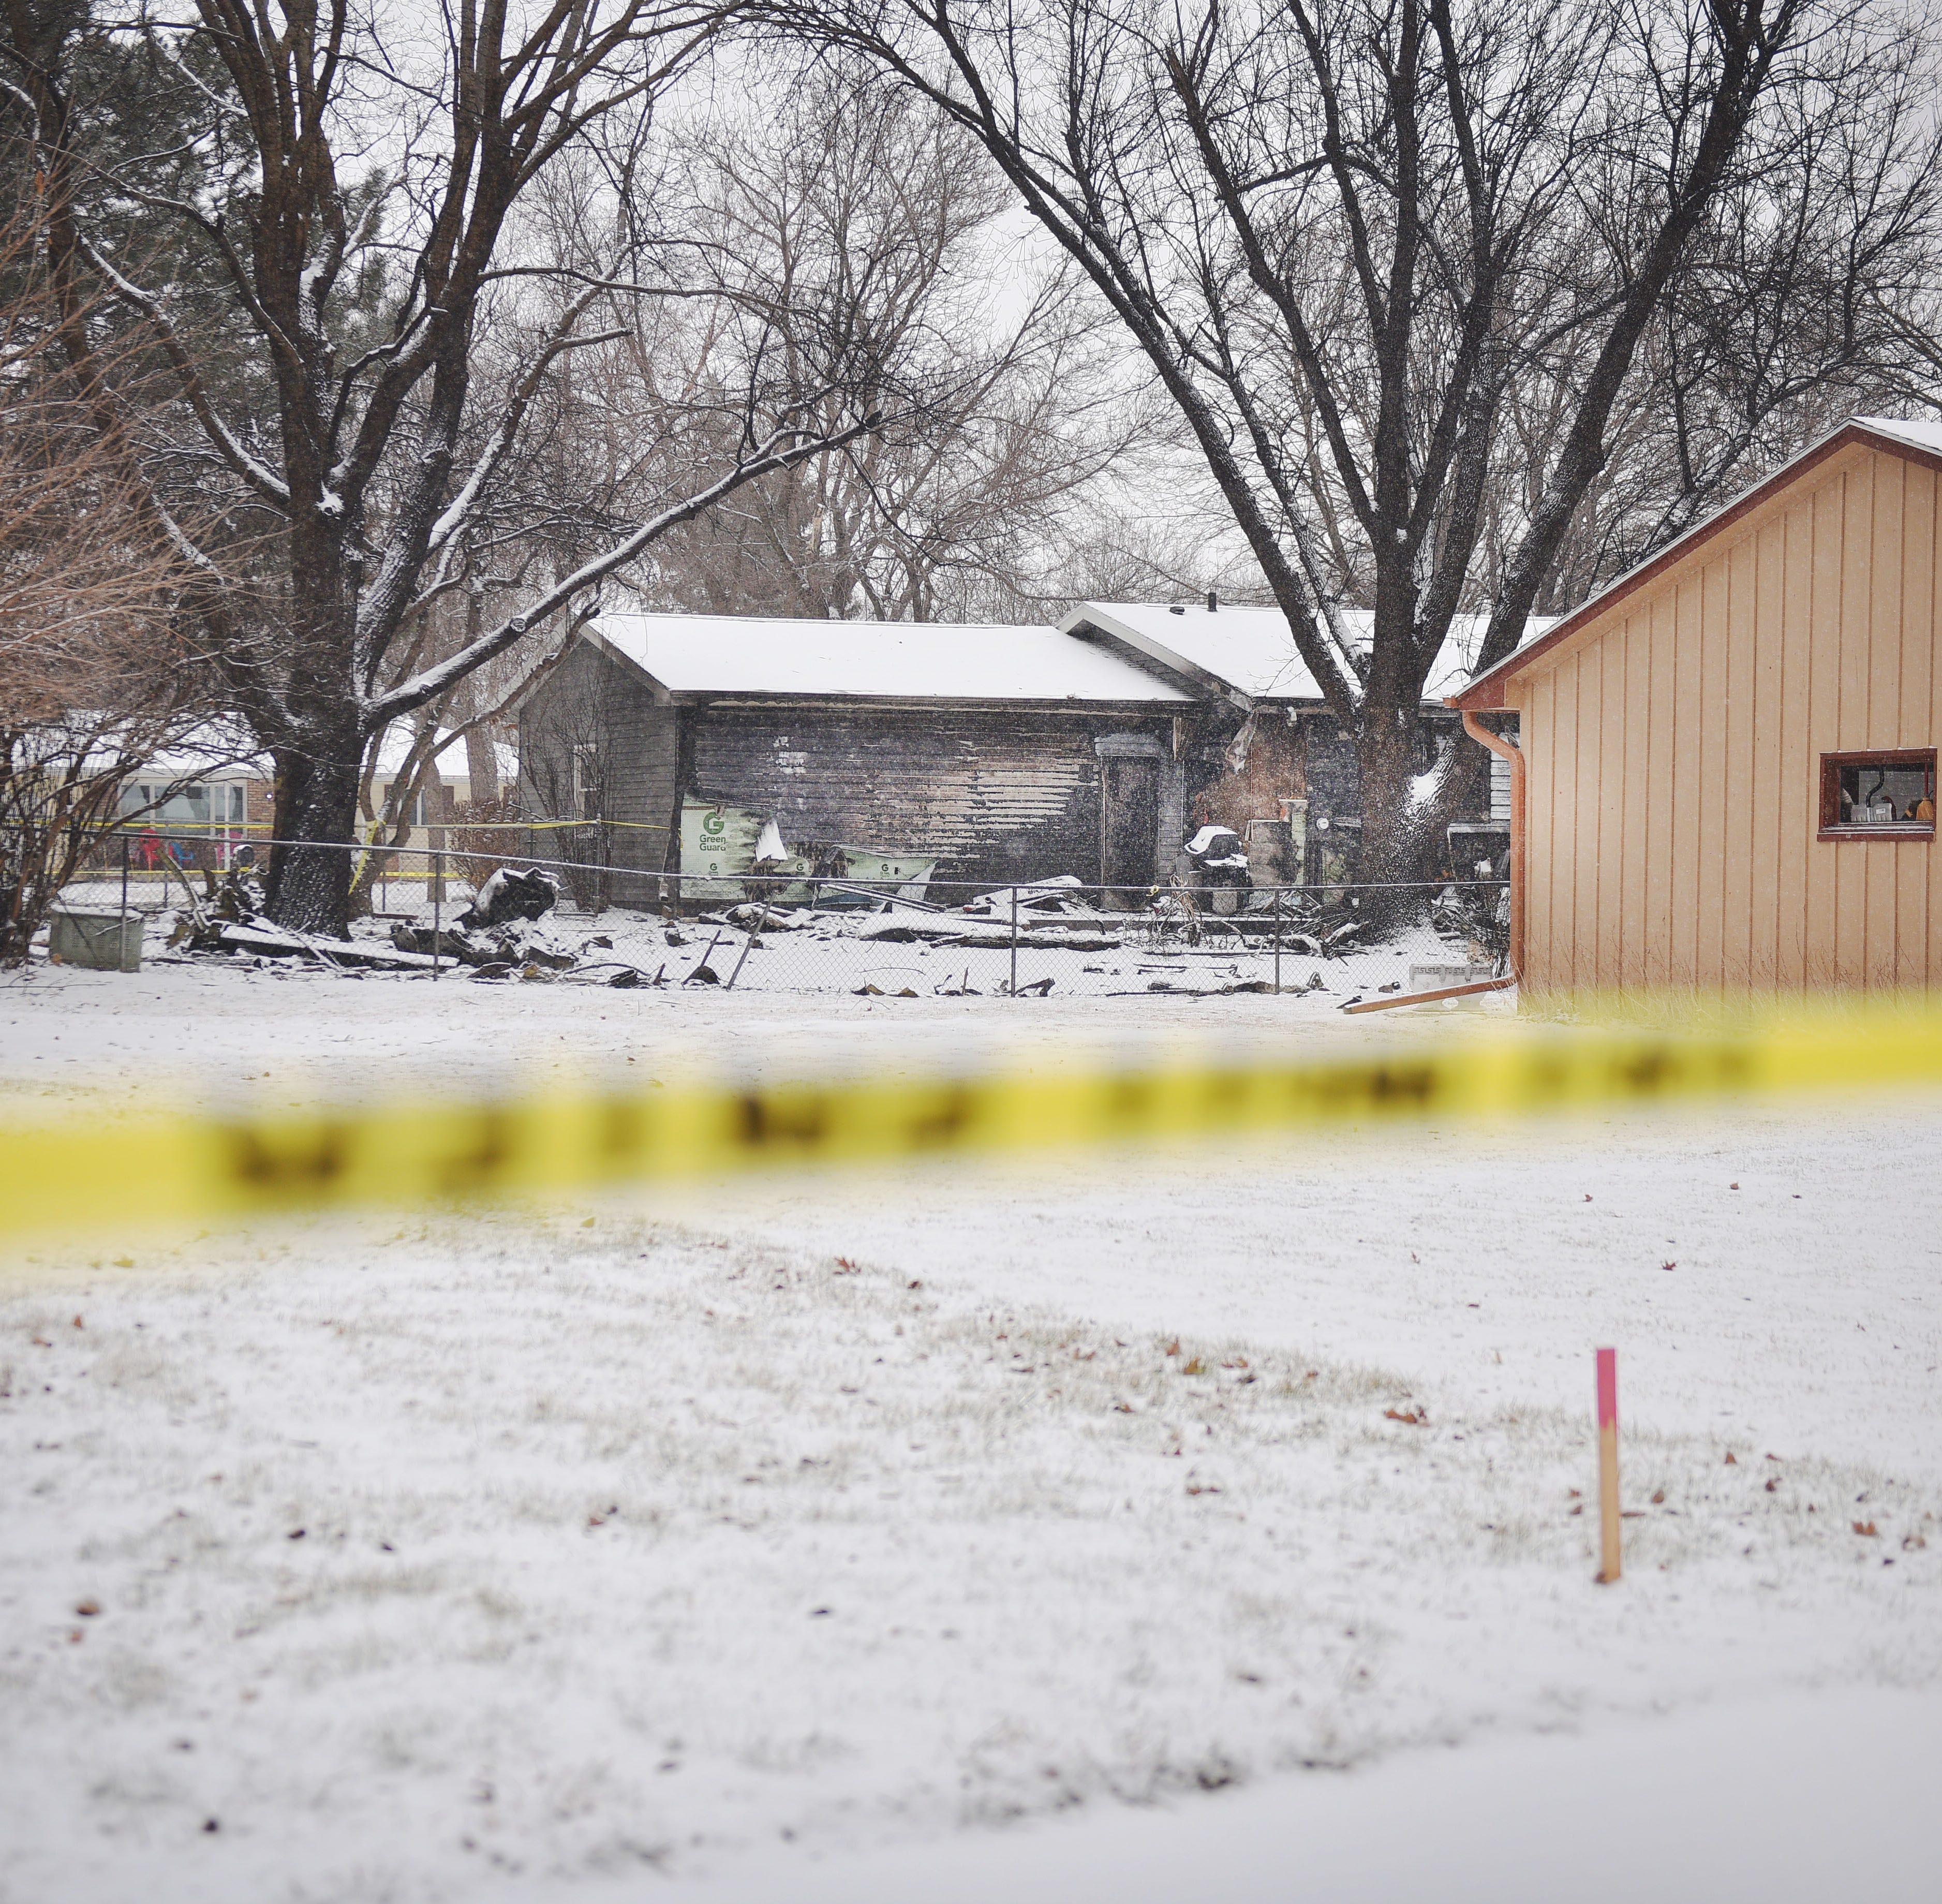 South Dakota plane crash investigations hindered by shutdown